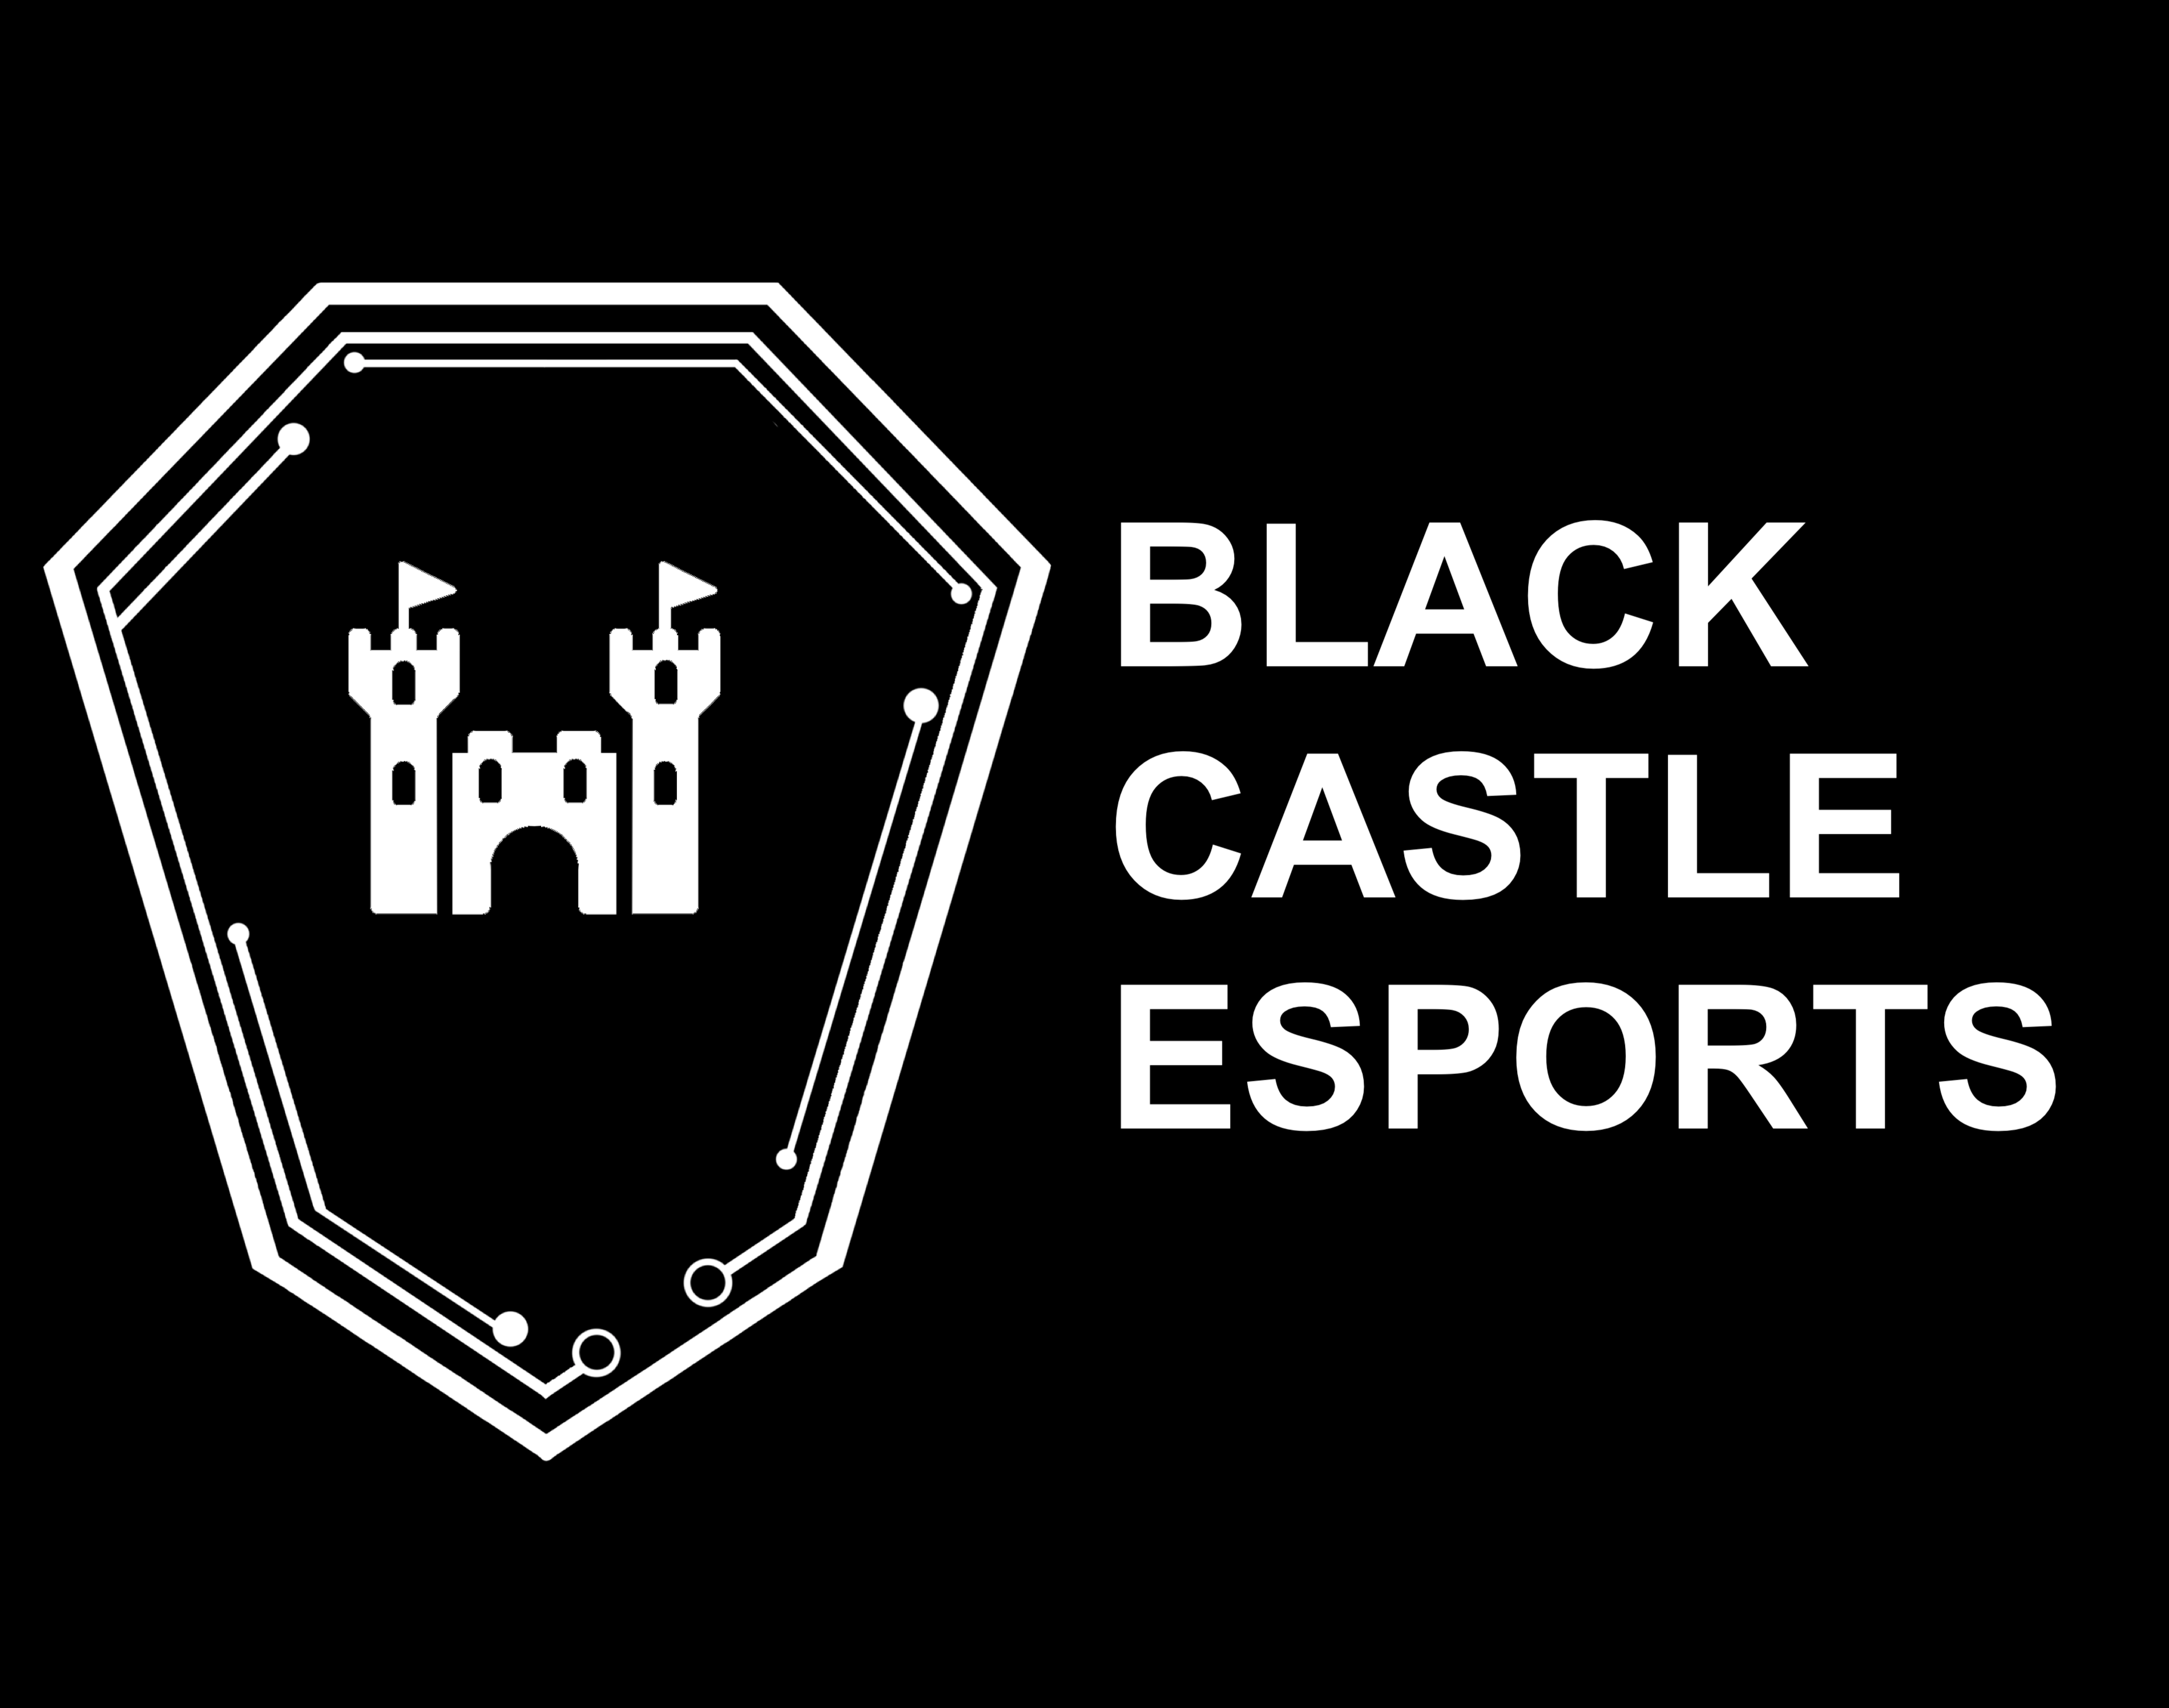 Black Castle Esports